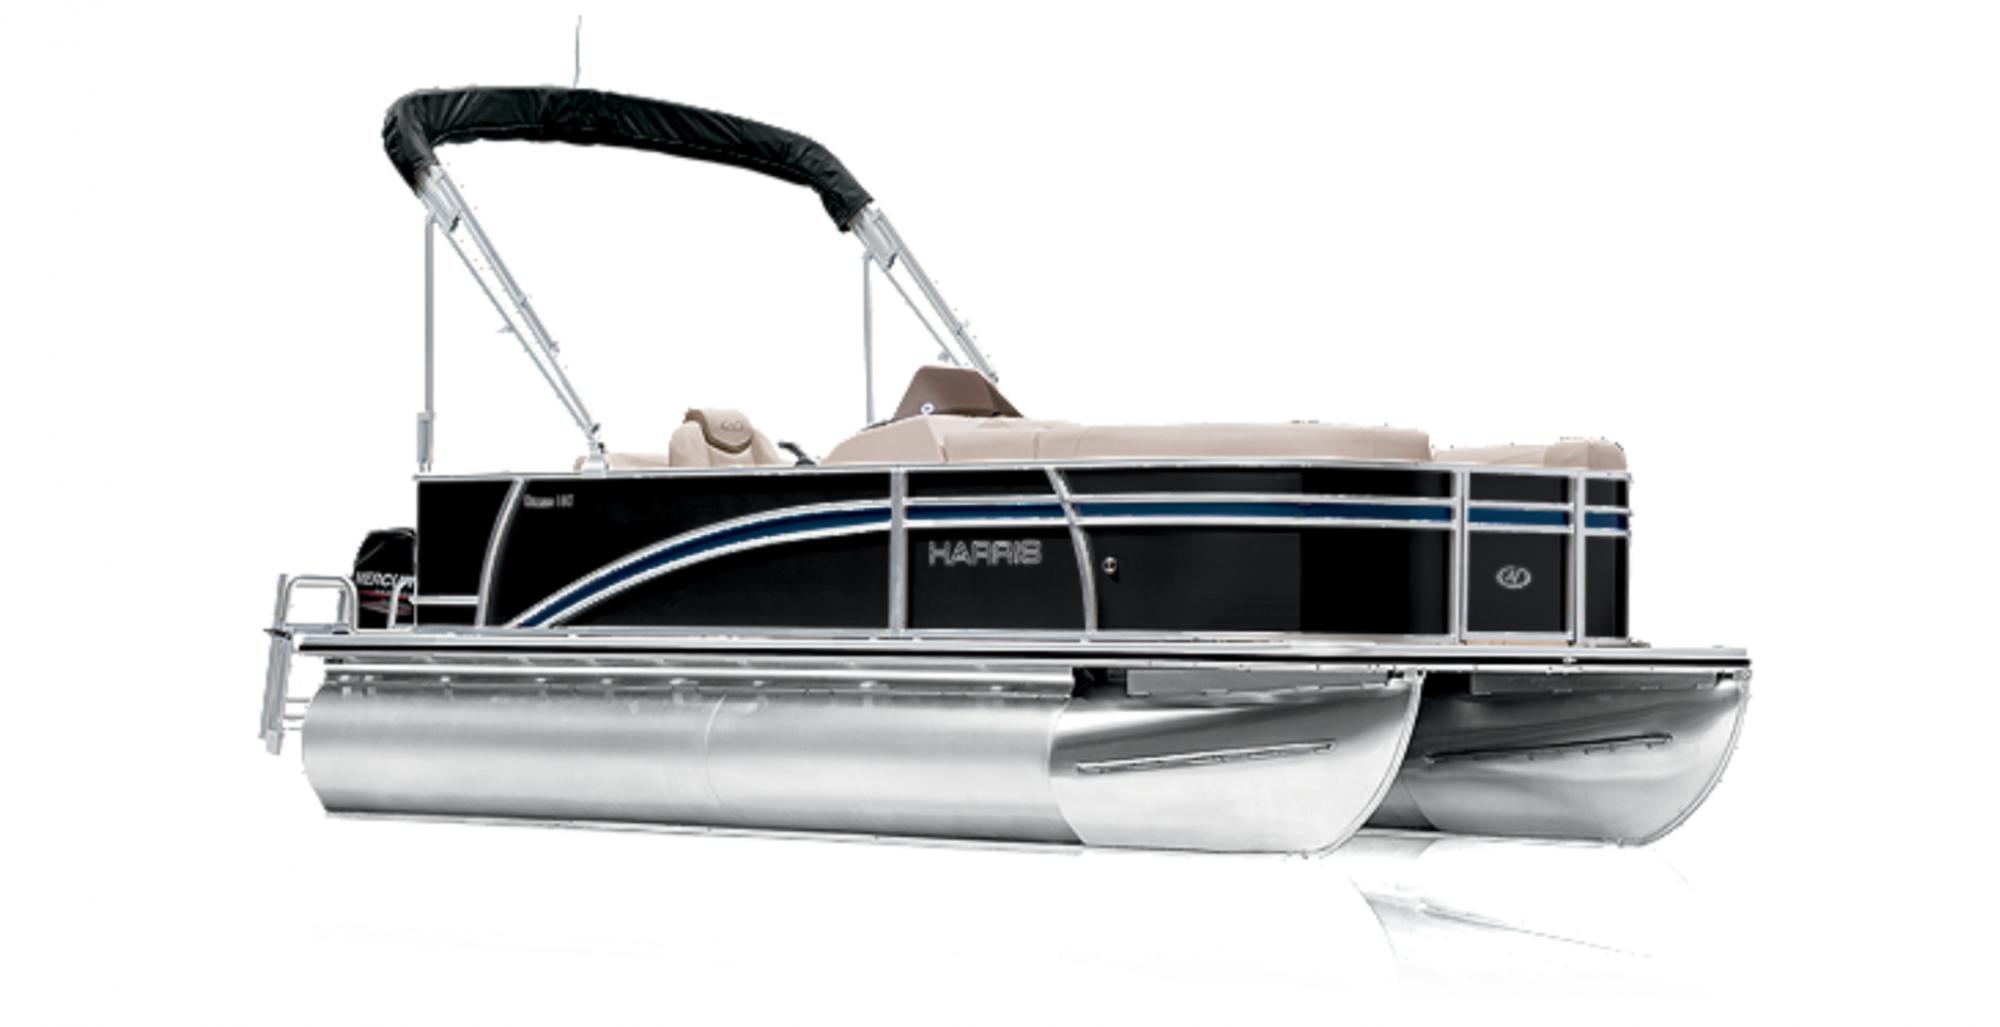 Harris Cruiser 210 - black and blue